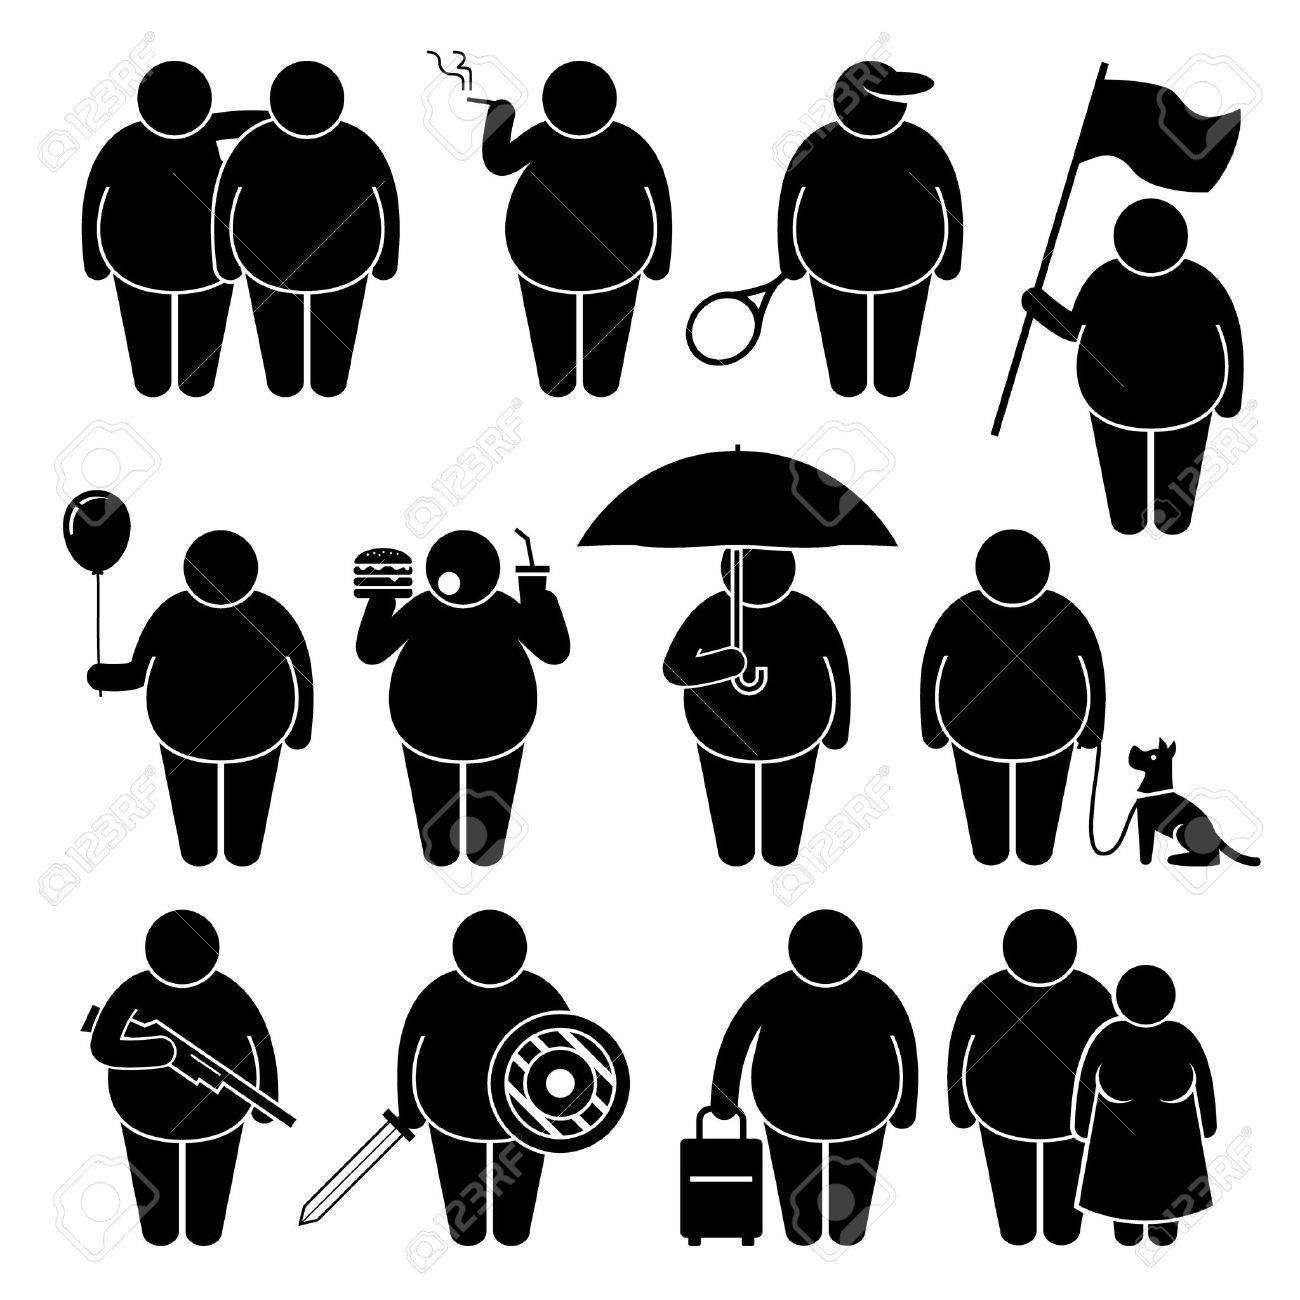 Fat Man Holding Using Various Objects Stick Figure Pictogram Icons Foto de archivo - 38625242